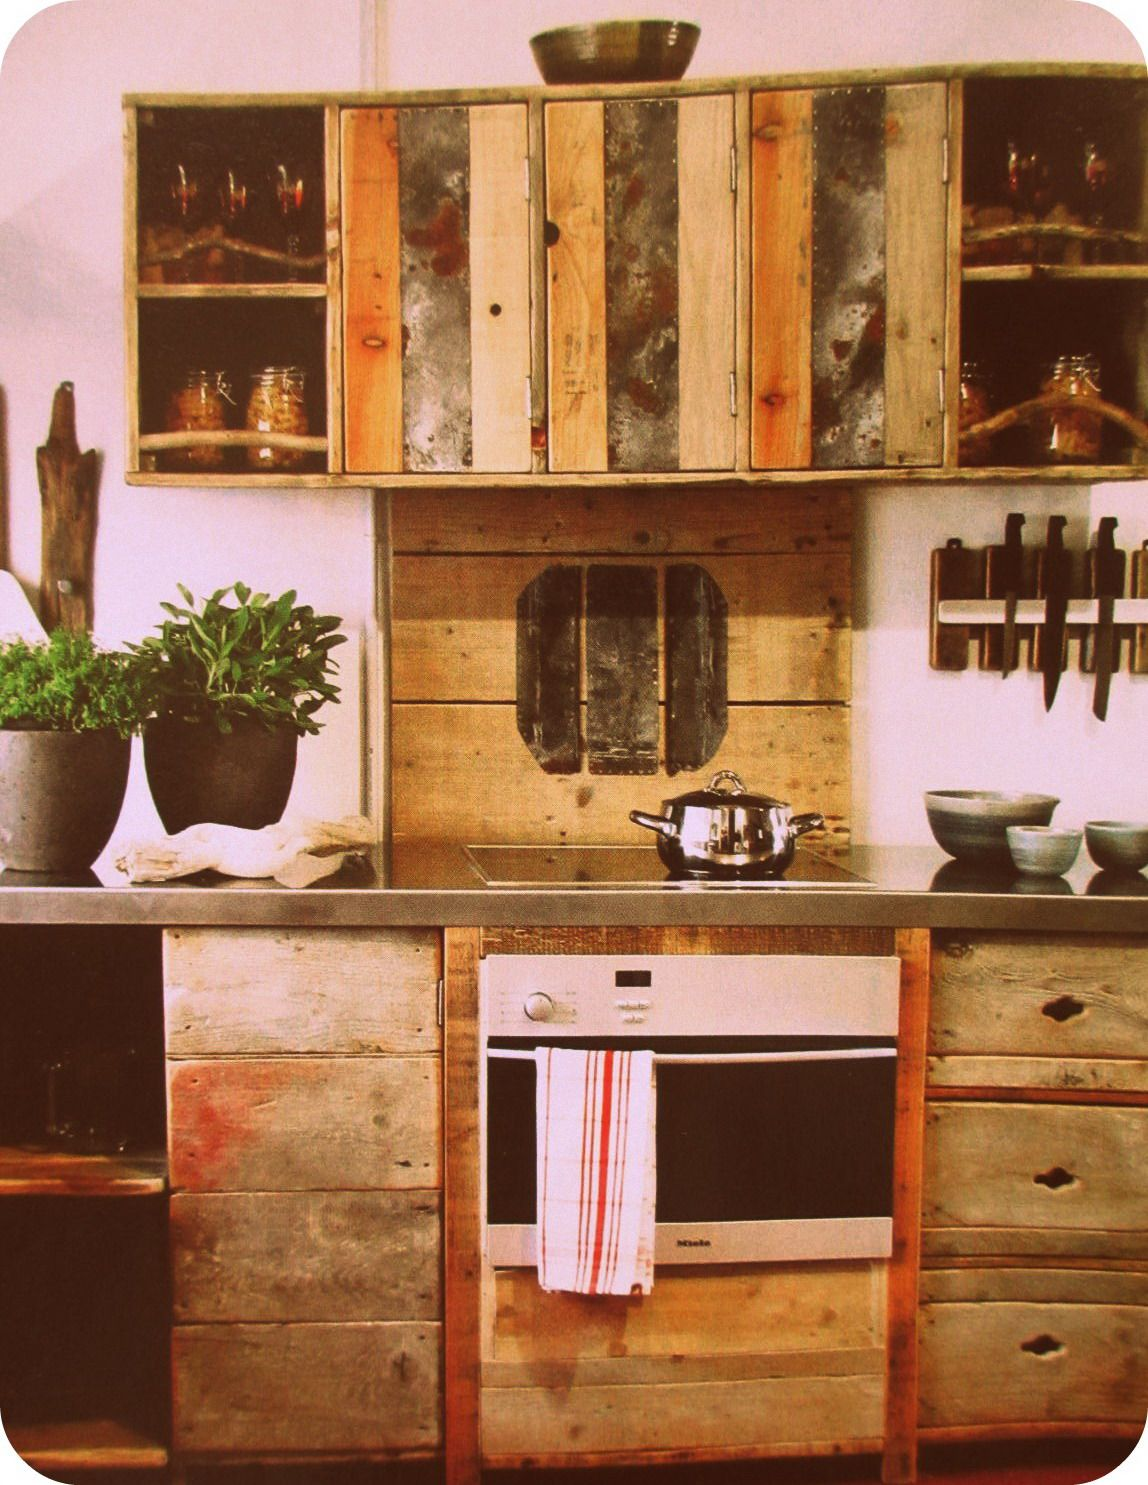 3 ideas de cocinas con palets que te encantar n for Muebles con tarimas para cocina